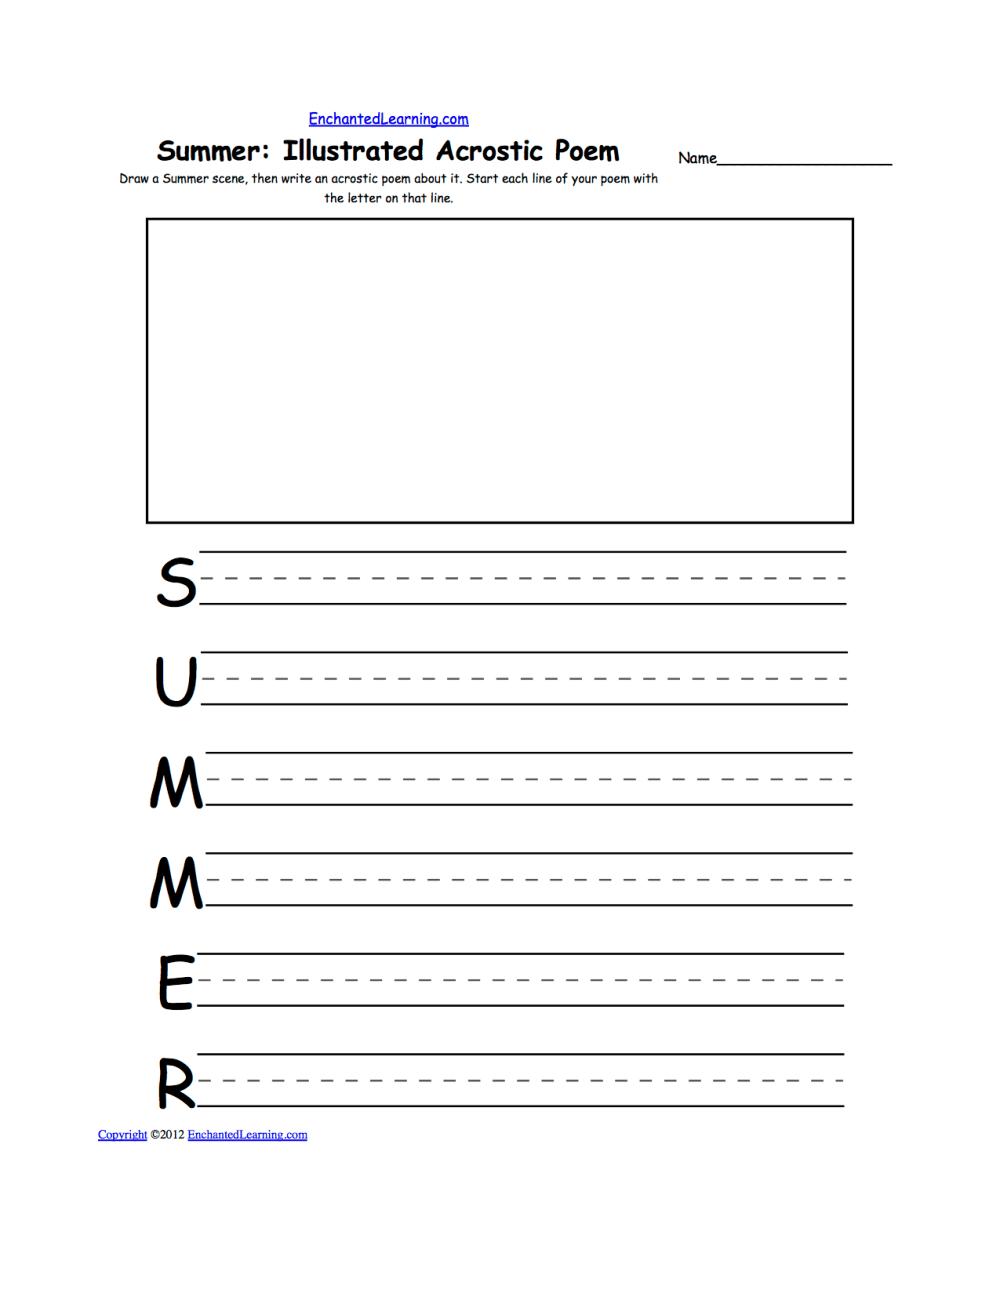 medium resolution of Illustrated Acrostic Poem Worksheets: Worksheet Printout -  EnchantedLearning.com